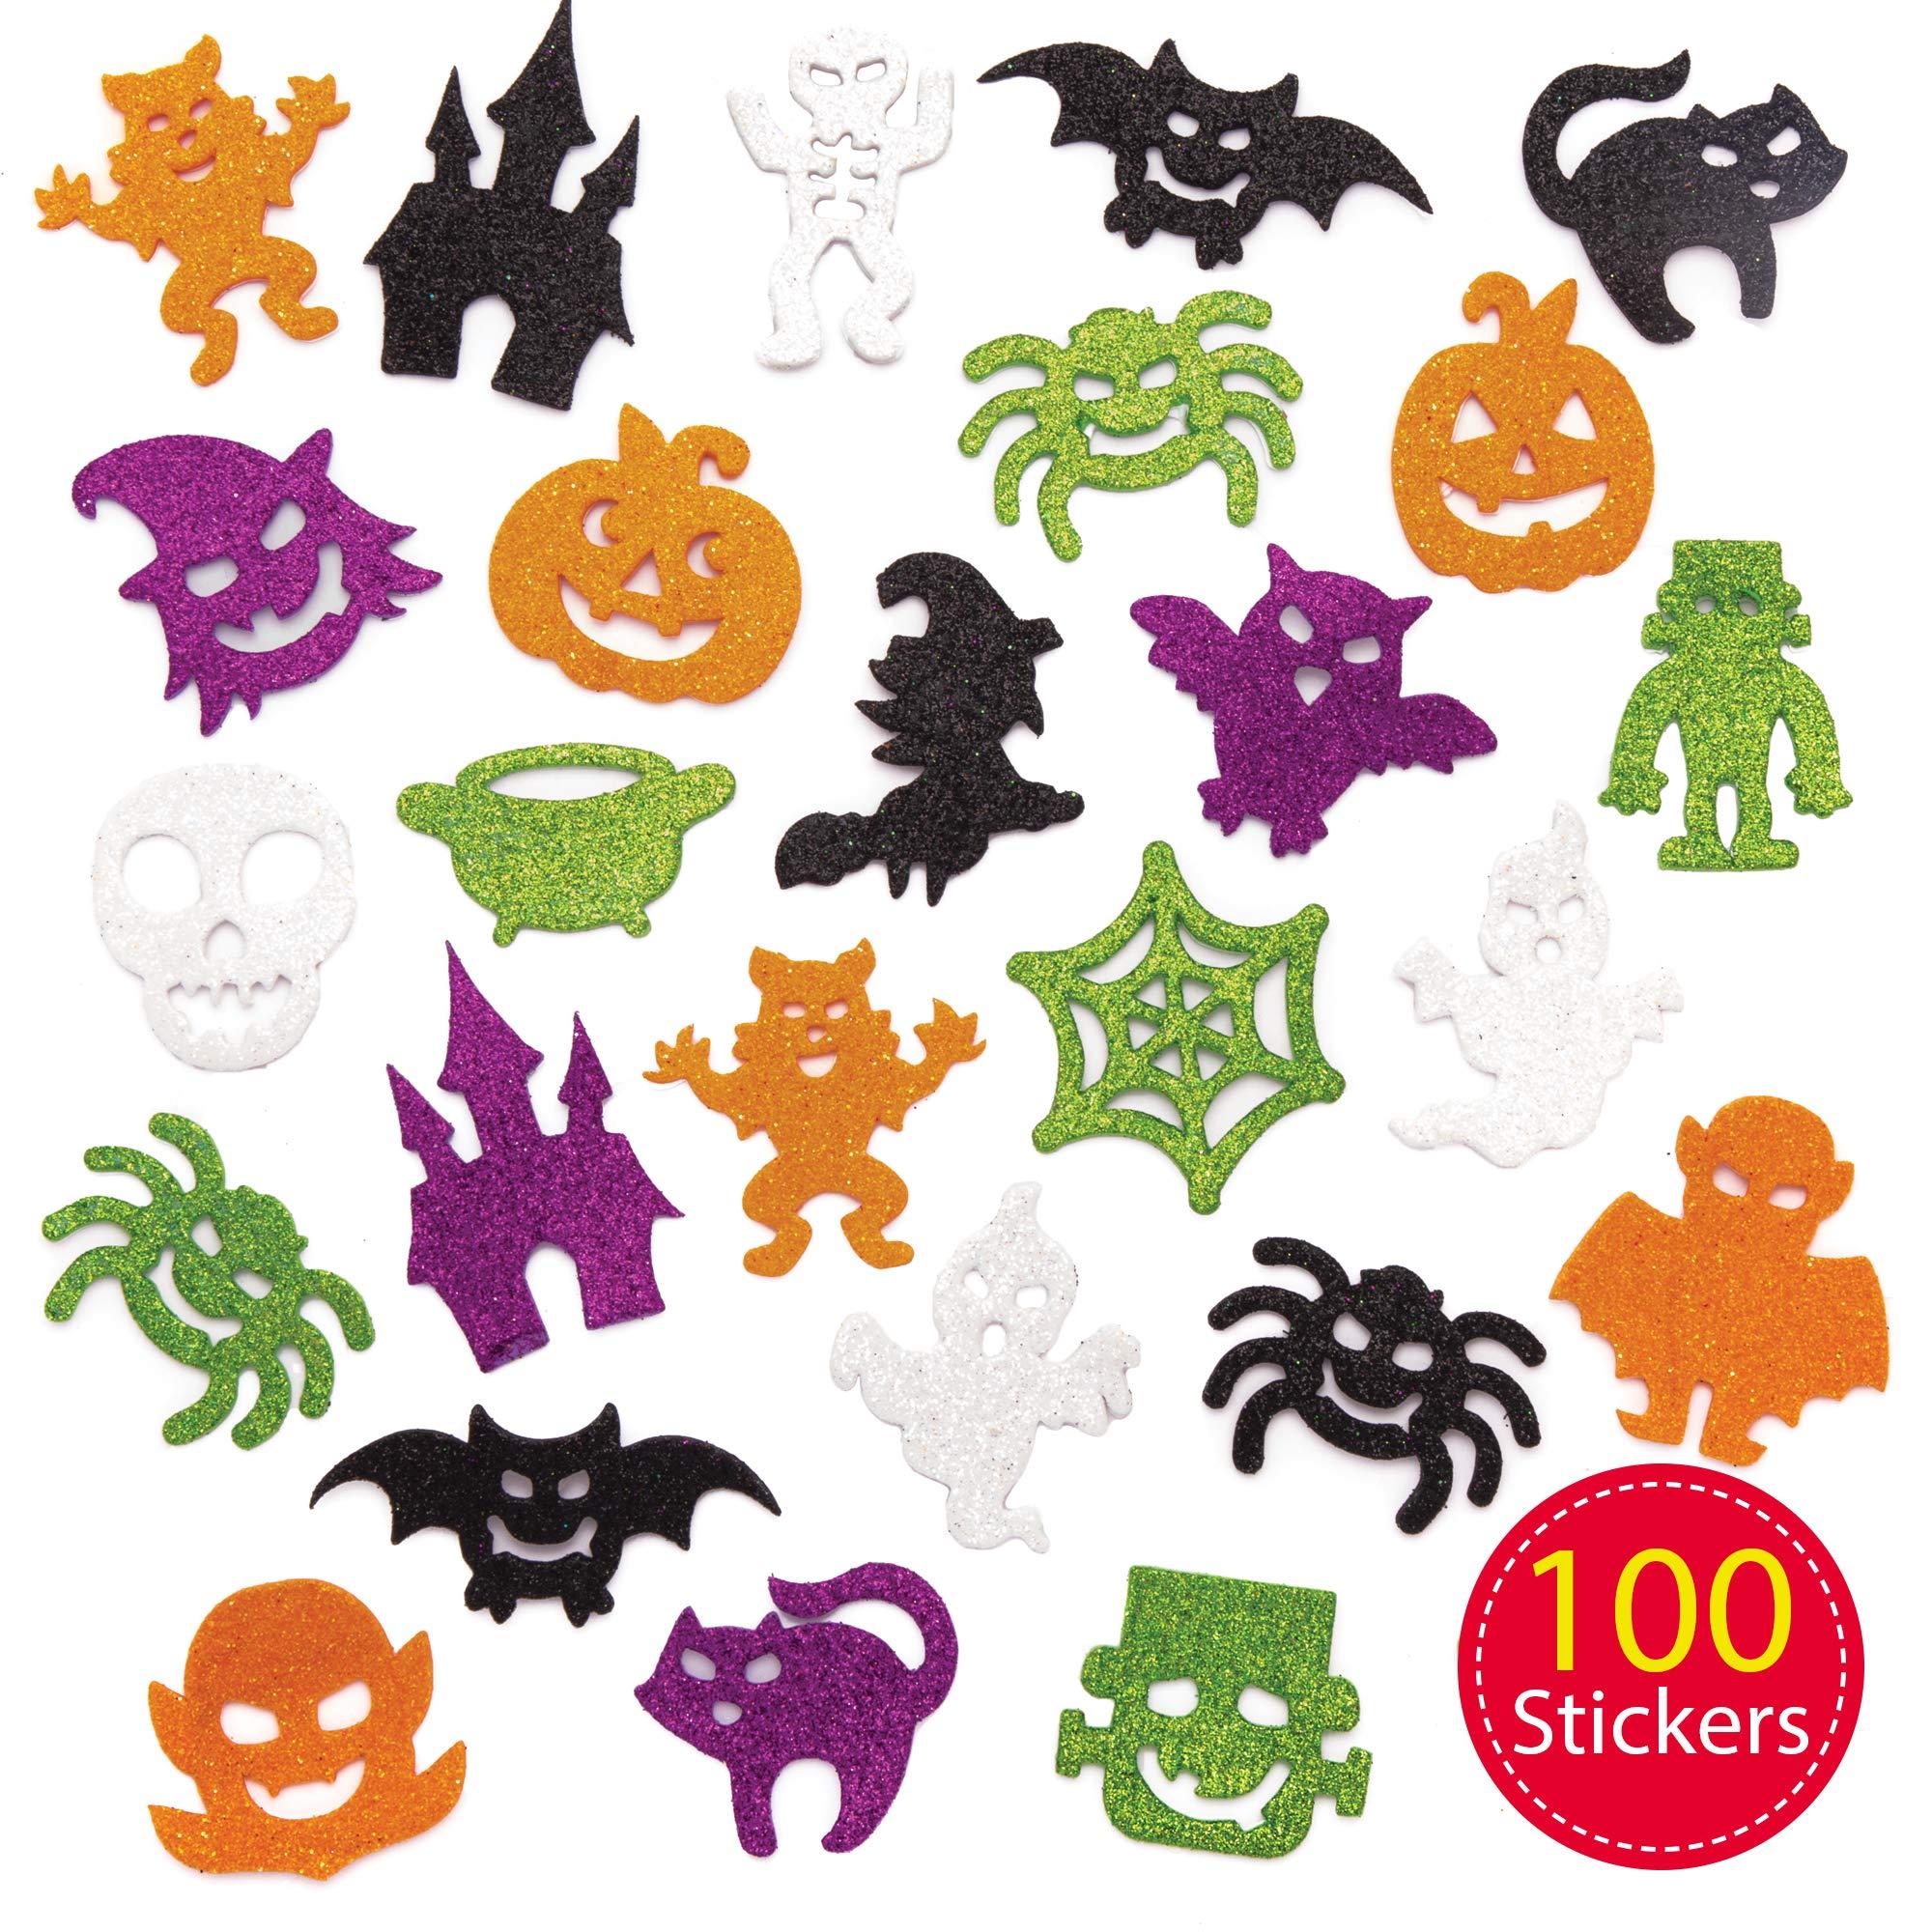 200 Stickers - 2 Rolls Glow-in-the-Dark Halloween Stickers